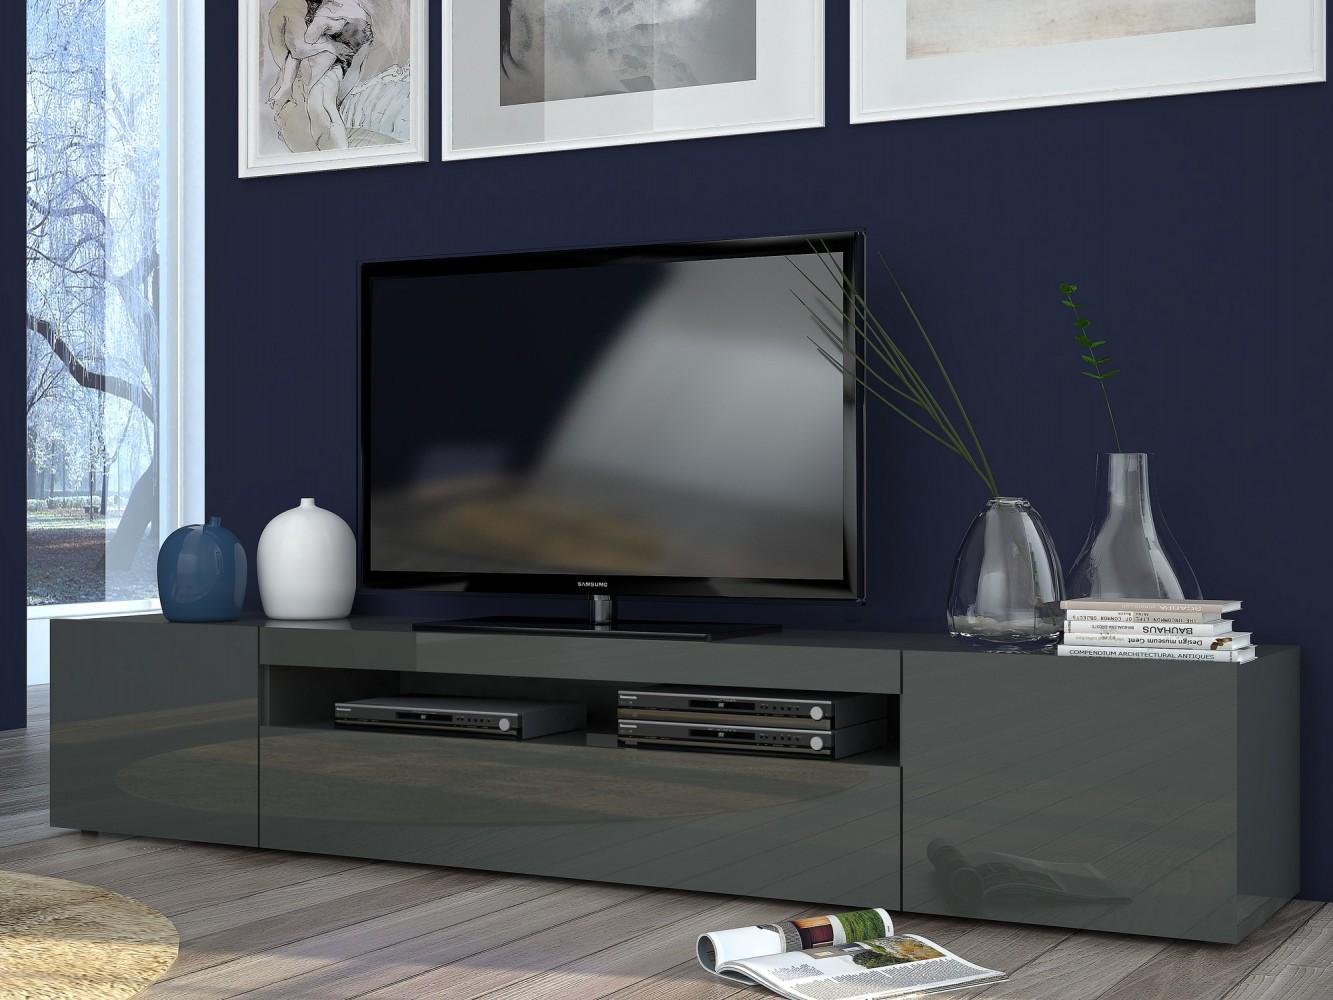 tecnos daiquiri lowboard 200cm wohnwand mediawand italian design modern neu ebay. Black Bedroom Furniture Sets. Home Design Ideas